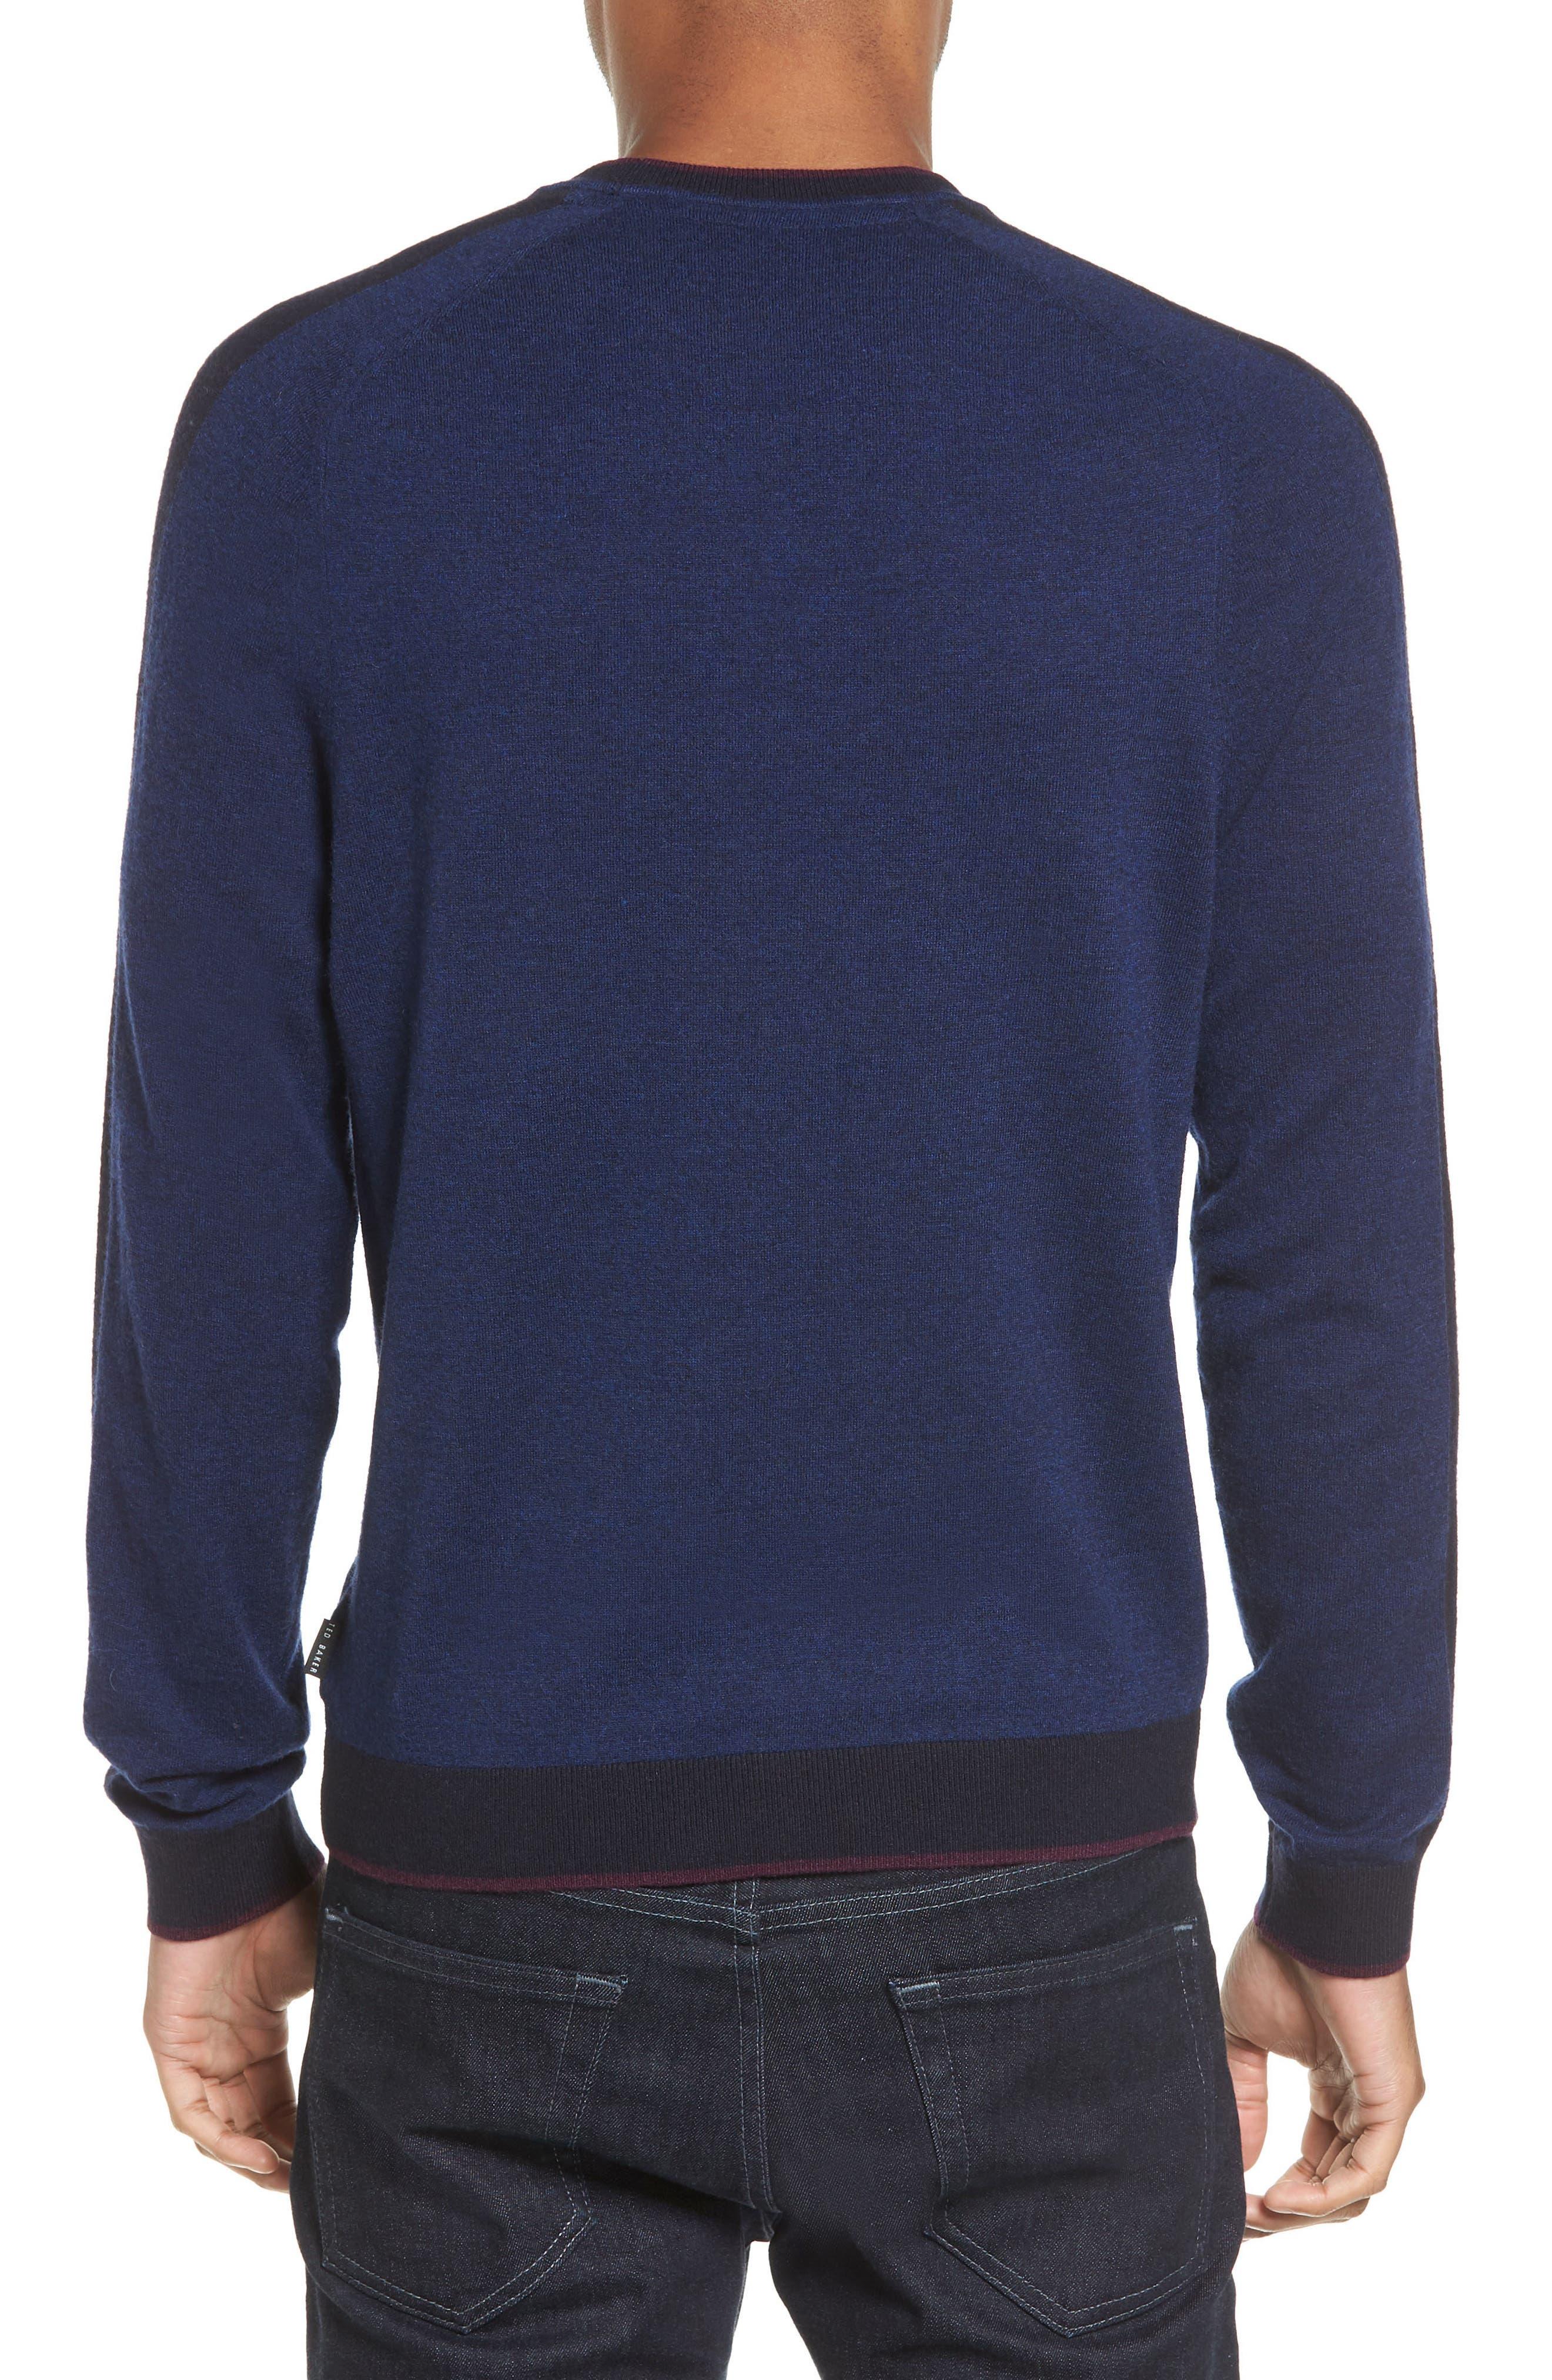 Norpol Crewneck Sweater,                             Alternate thumbnail 7, color,